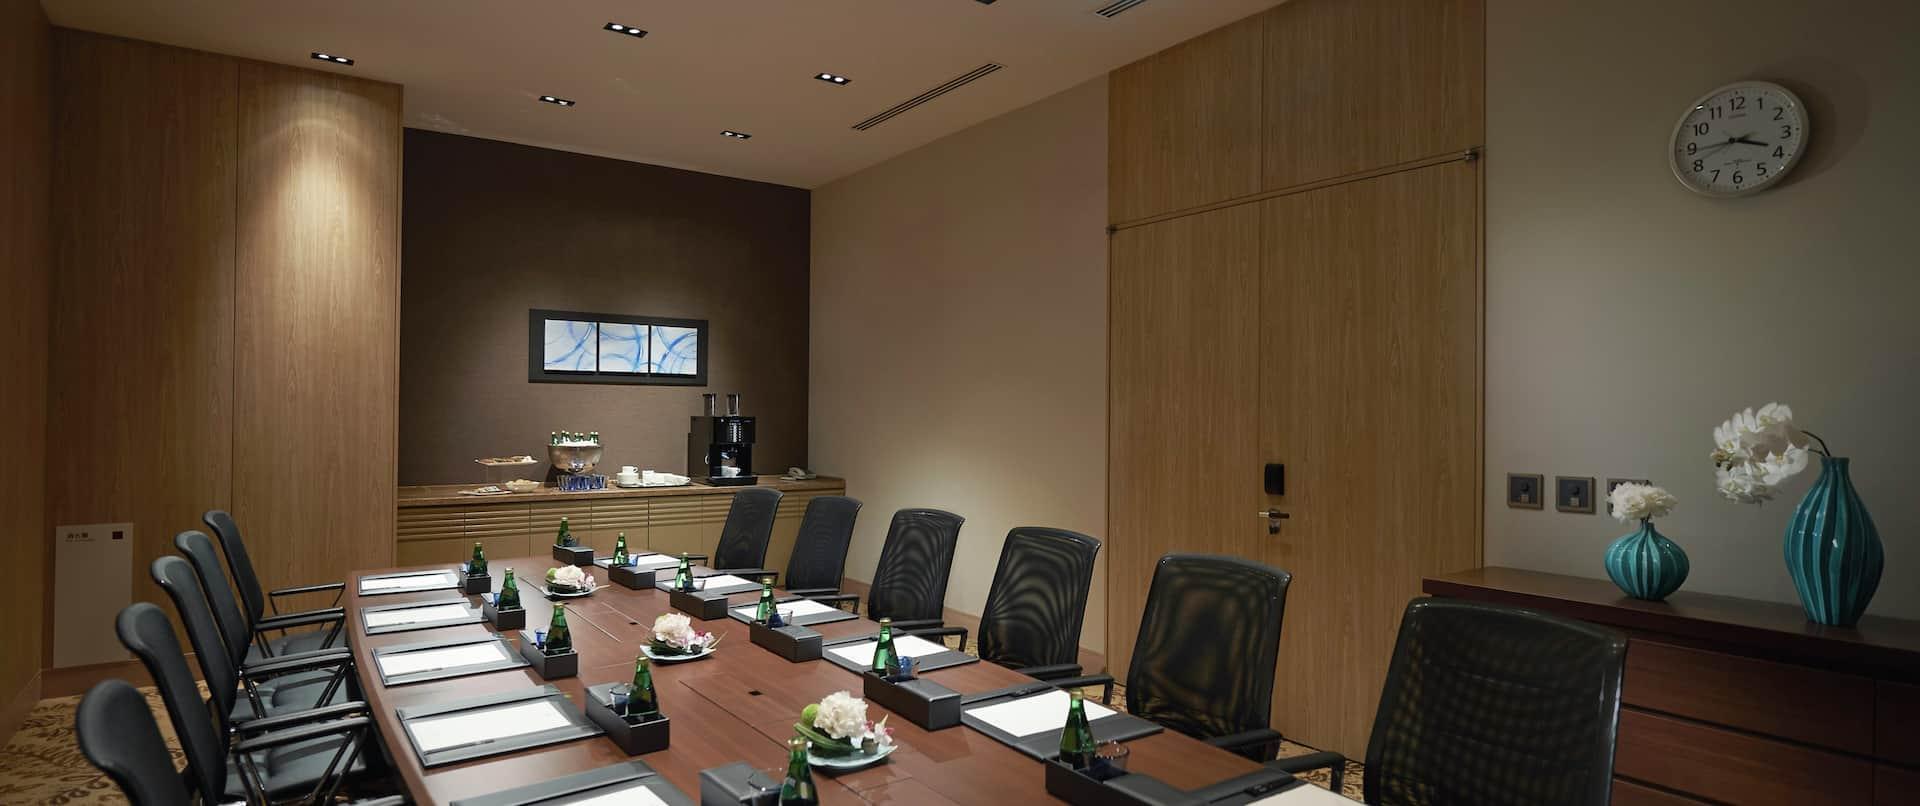 Meeting Room, Boardroom